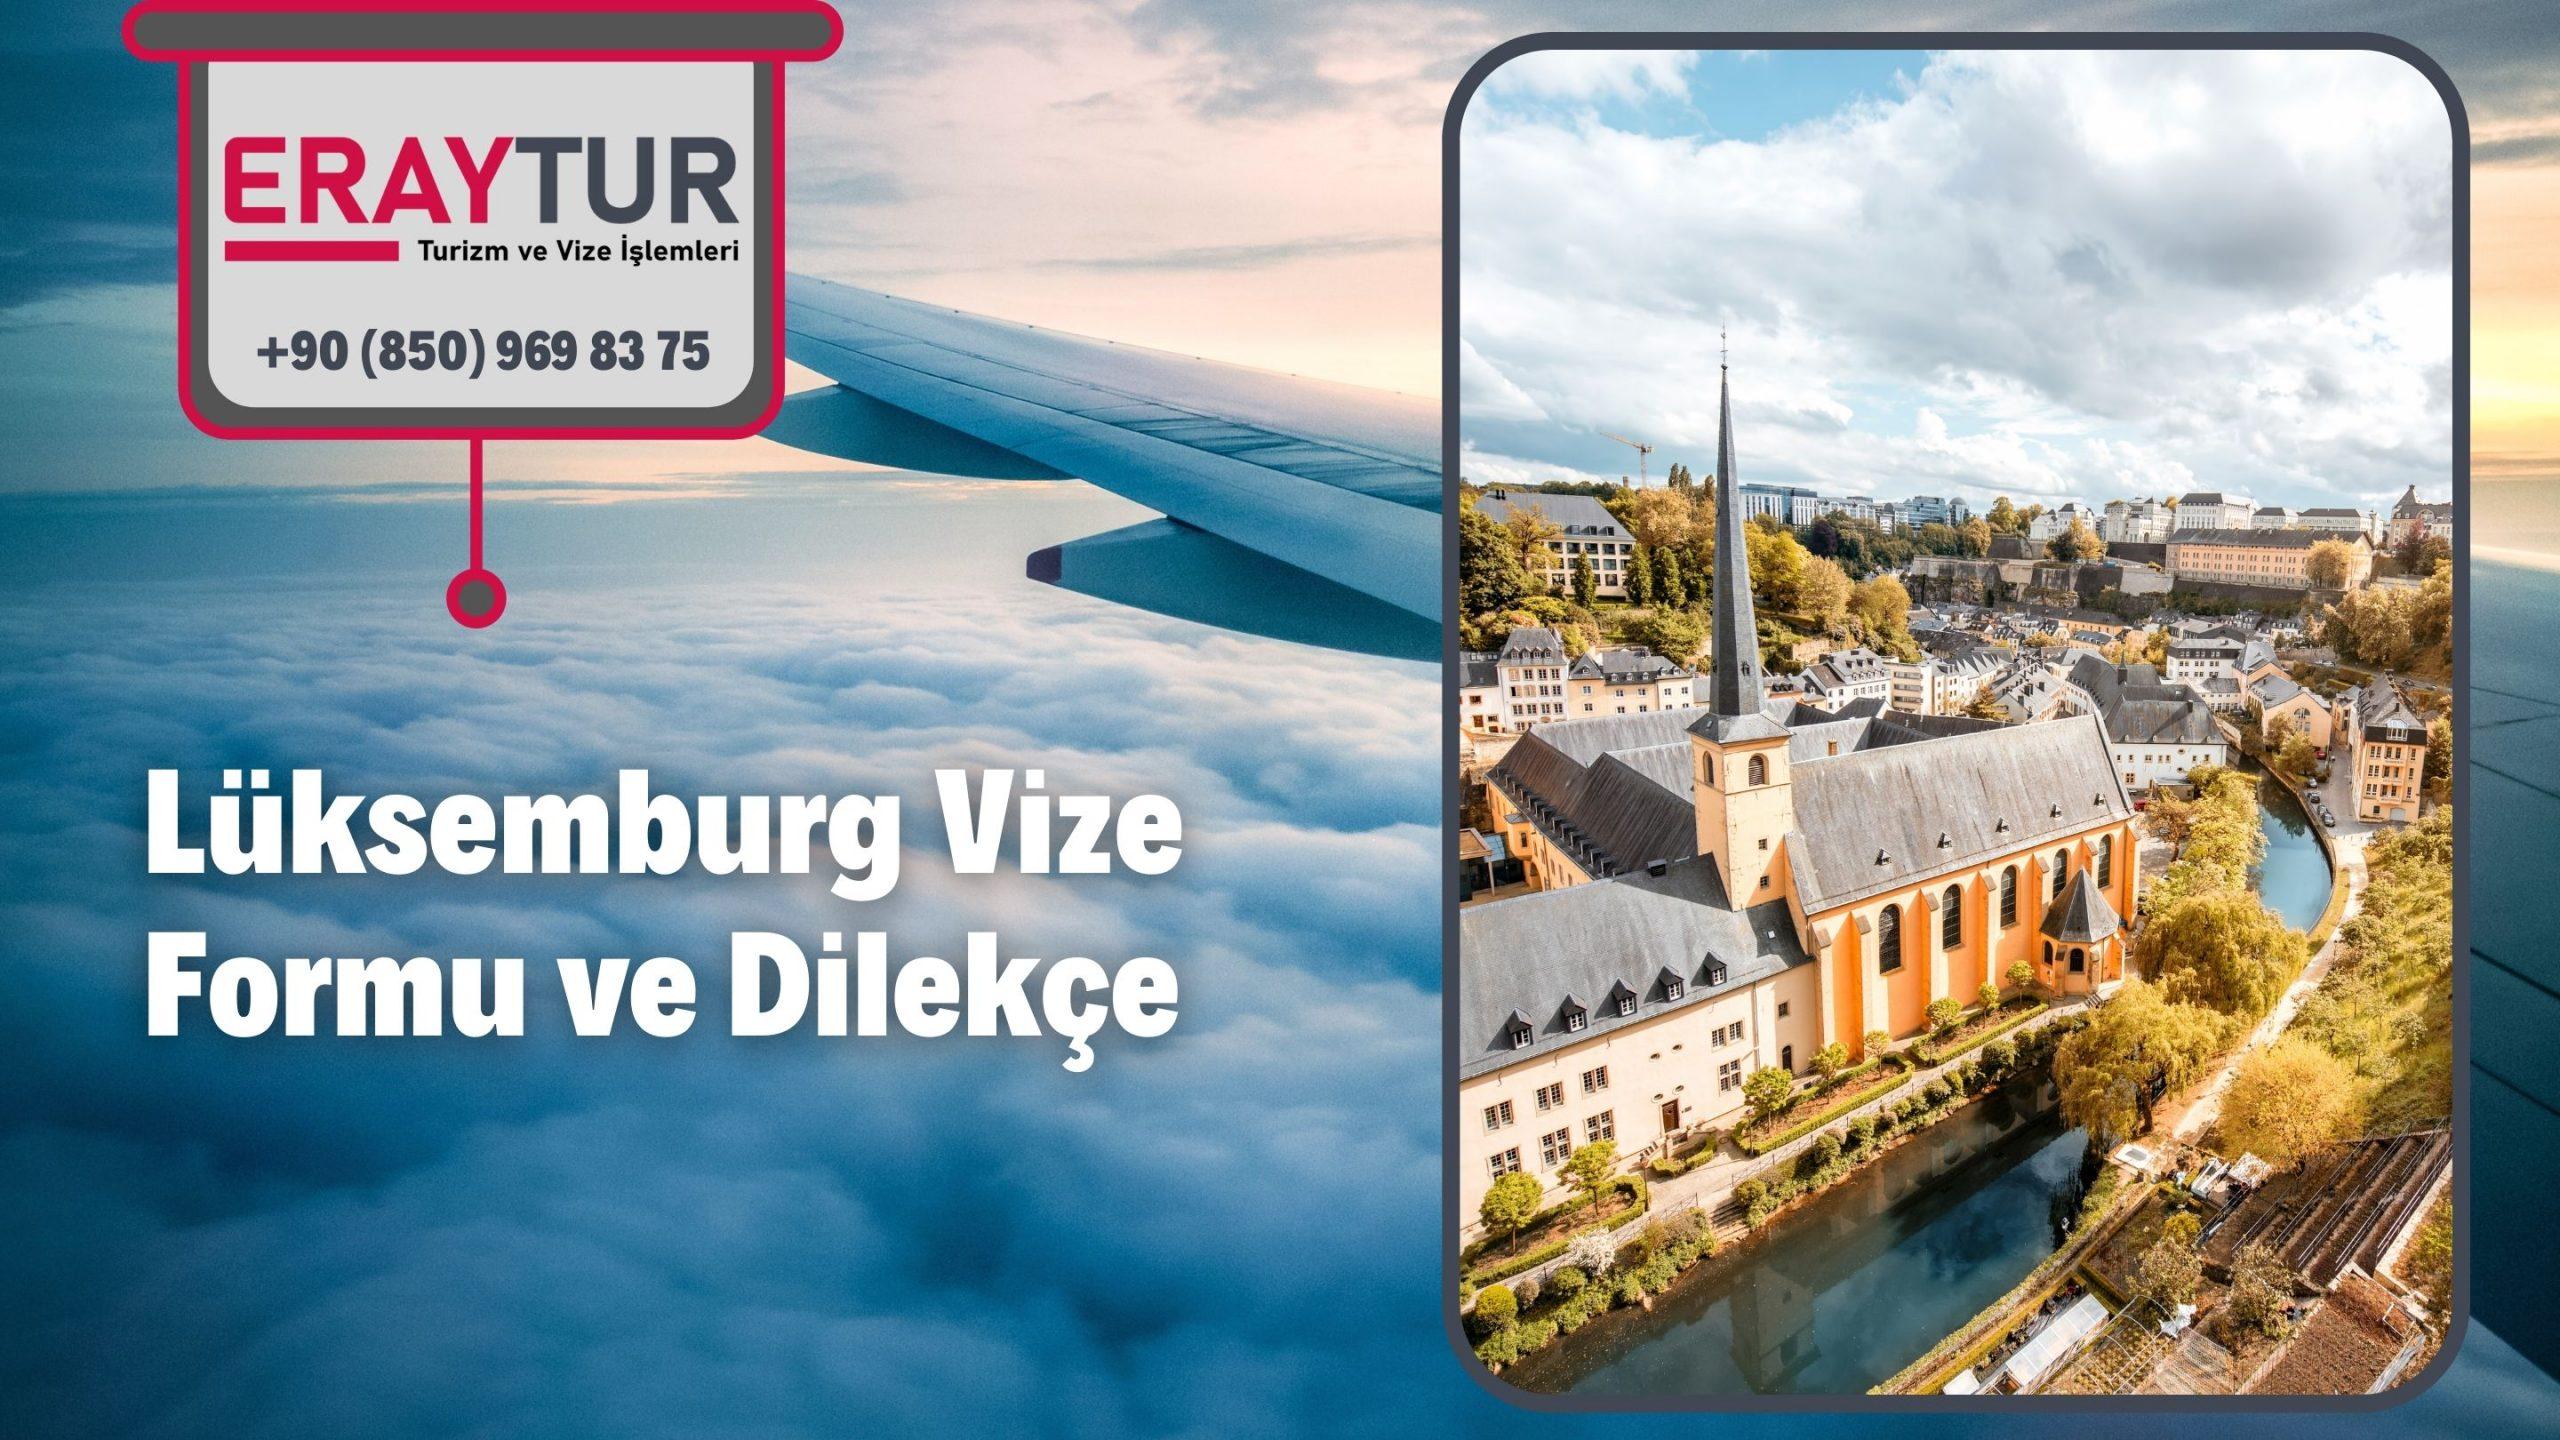 Lüksemburg Vize Formu ve Dilekçe 1 – luksemburg vize formu ve dilekce 1 scaled